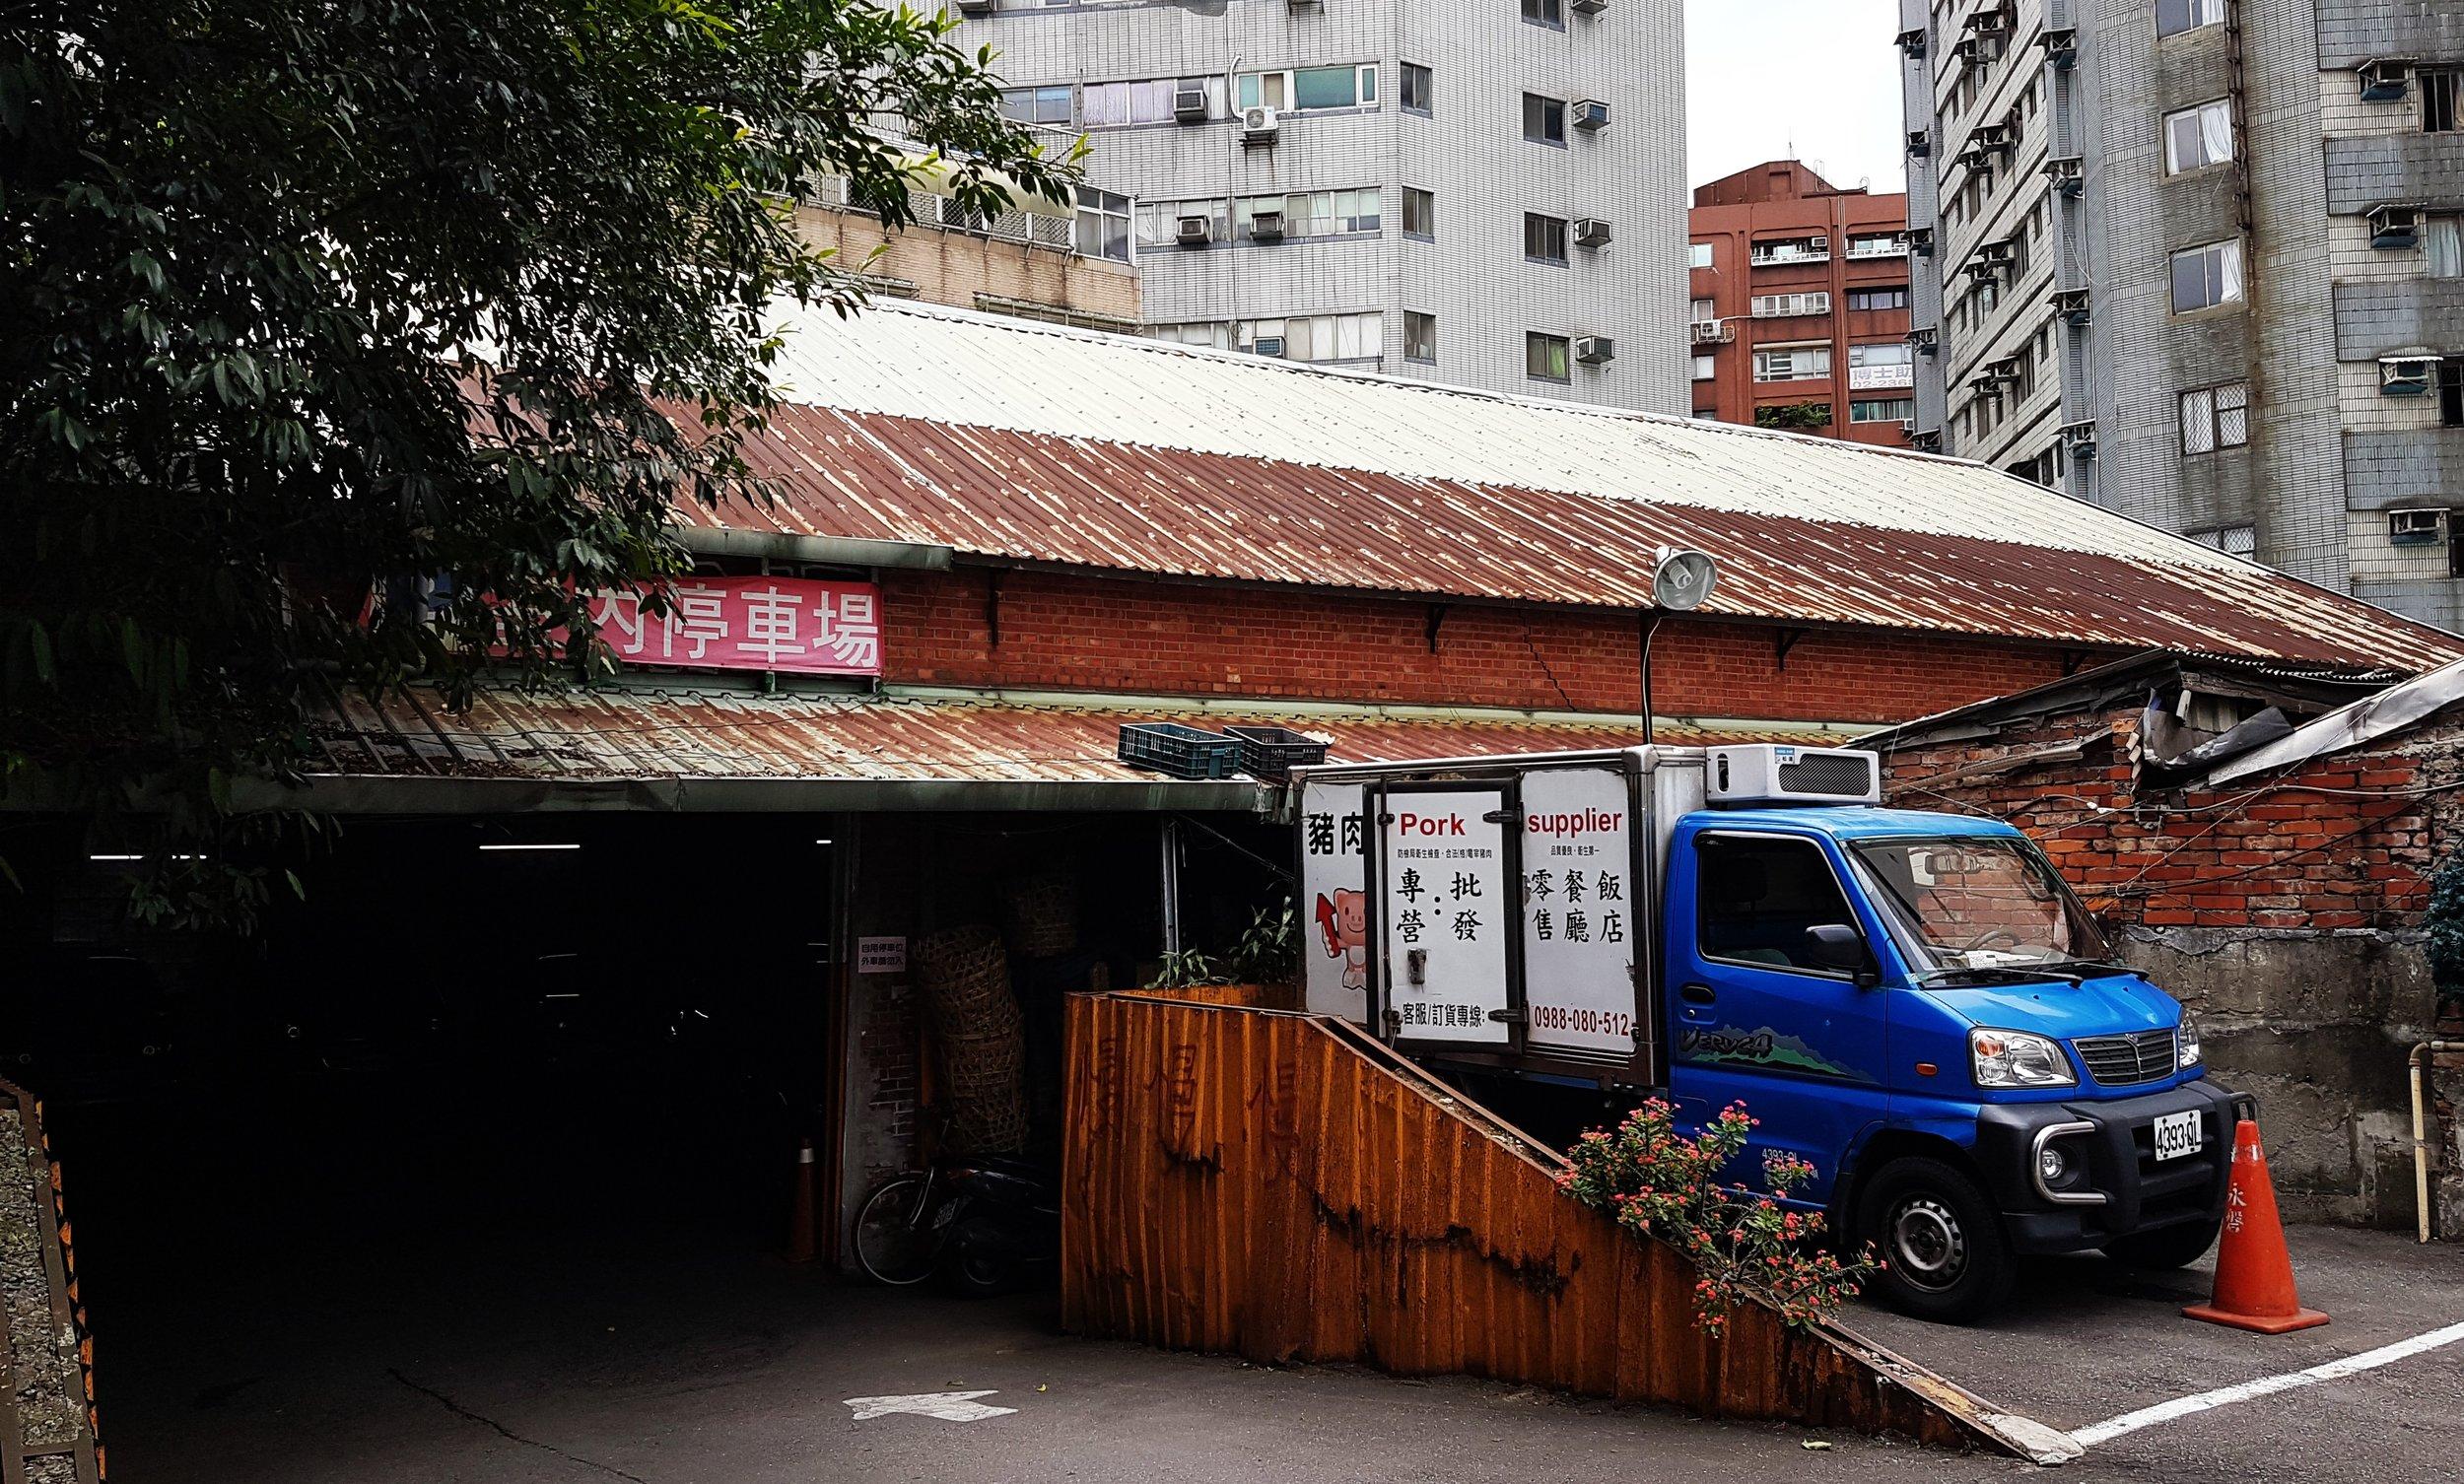 Guting Old Market (now a car park)